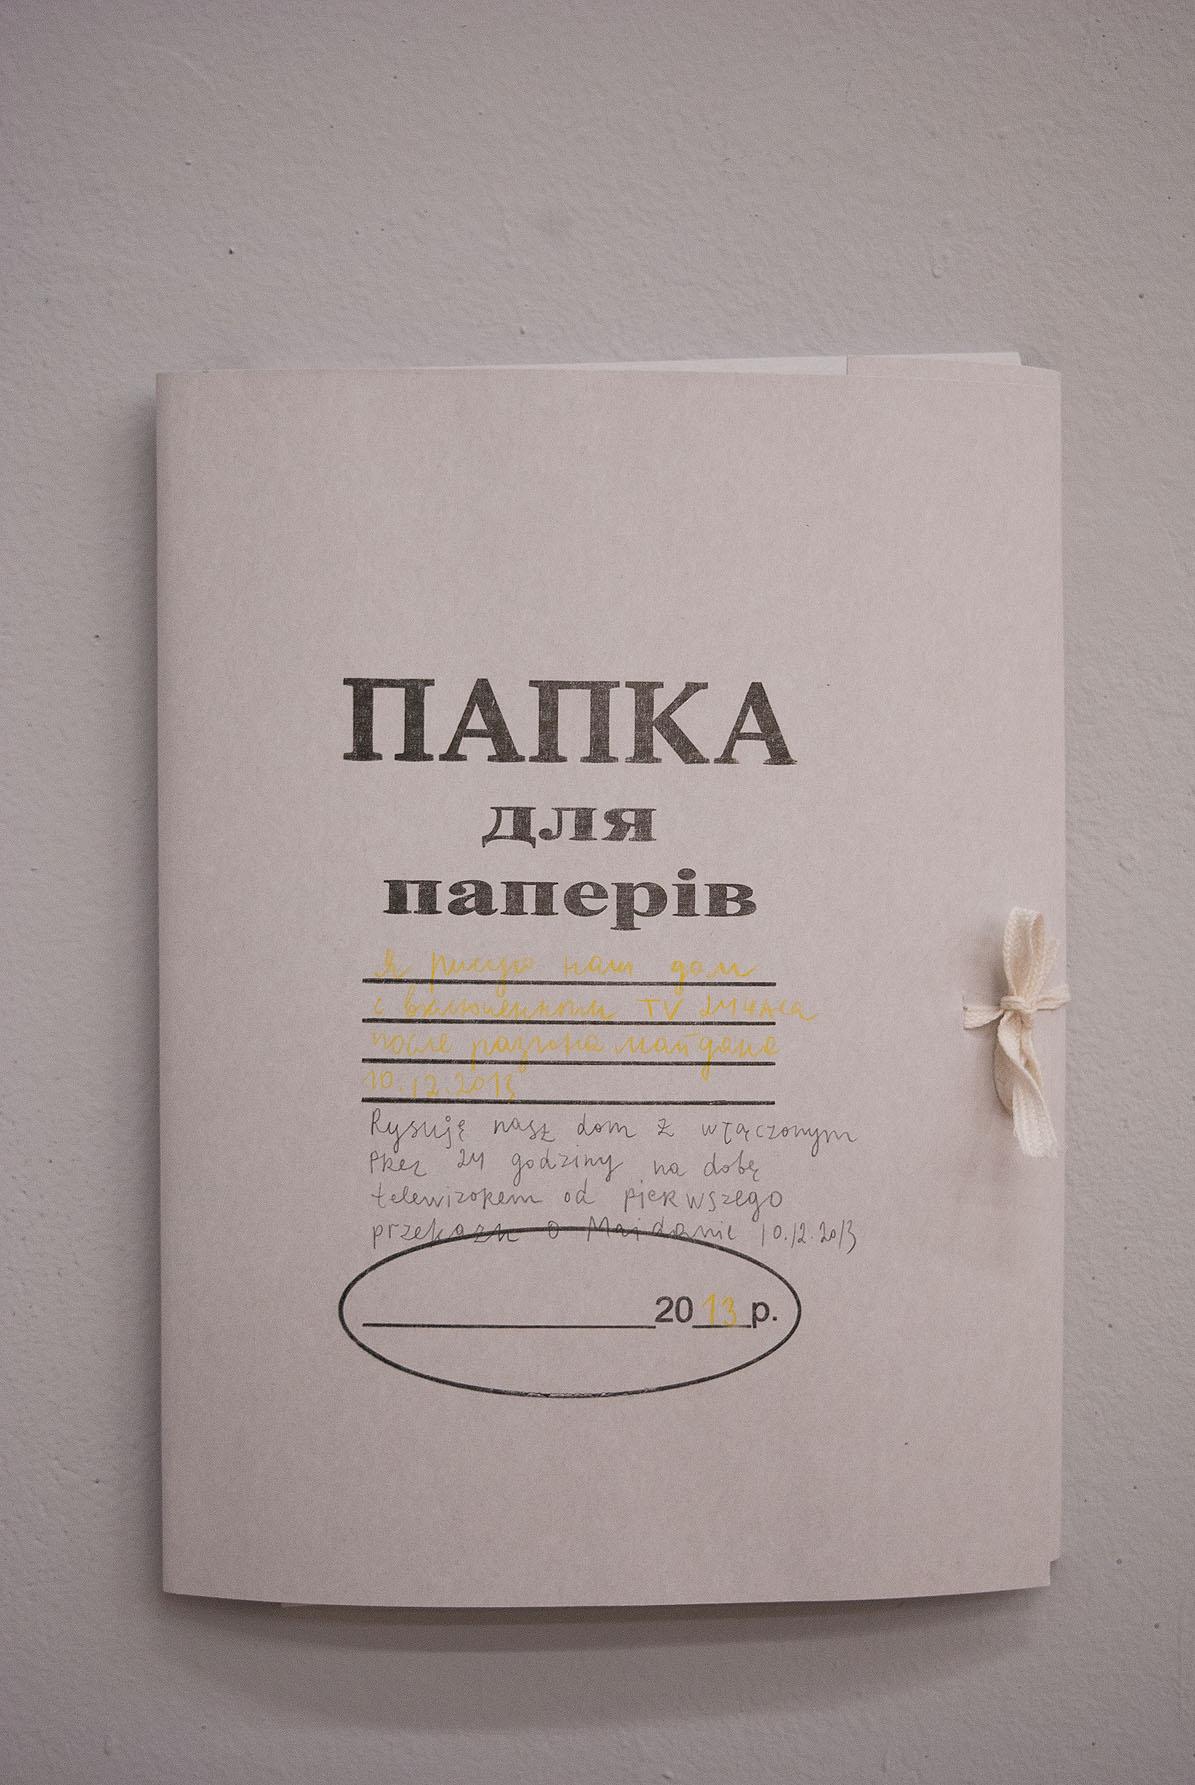 Alevtina Kakhidze, Rysuję rysunki od23-11-2013 dodziś